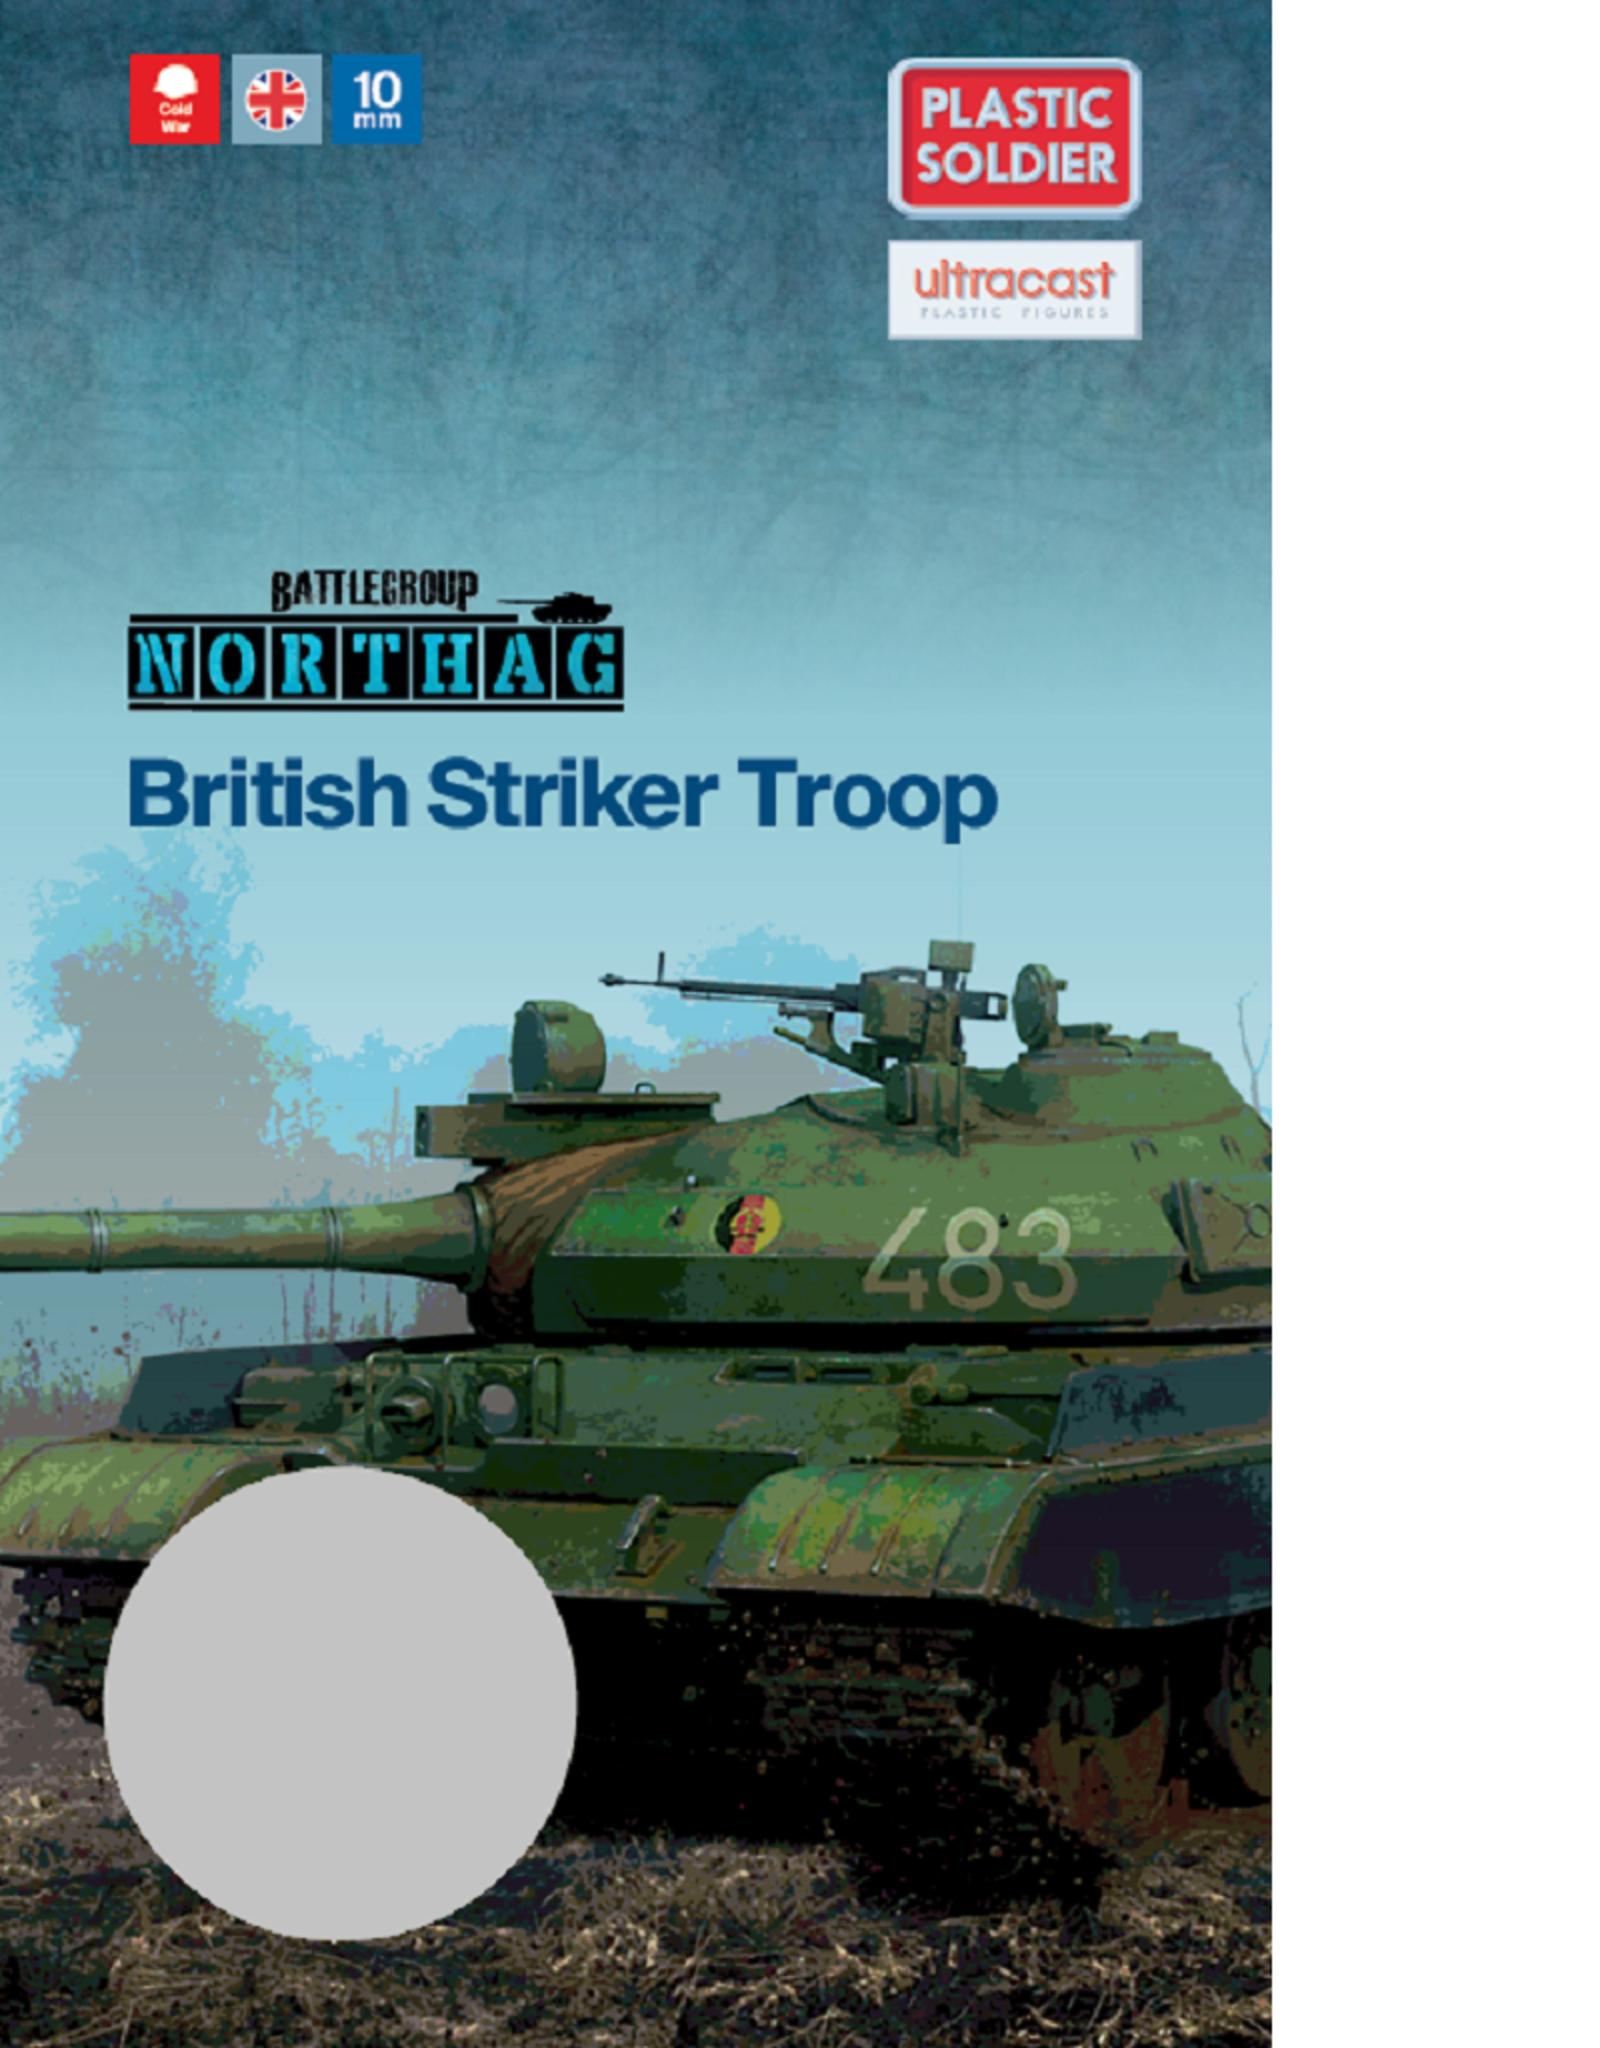 Plastic Soldier Company British Striker Troop